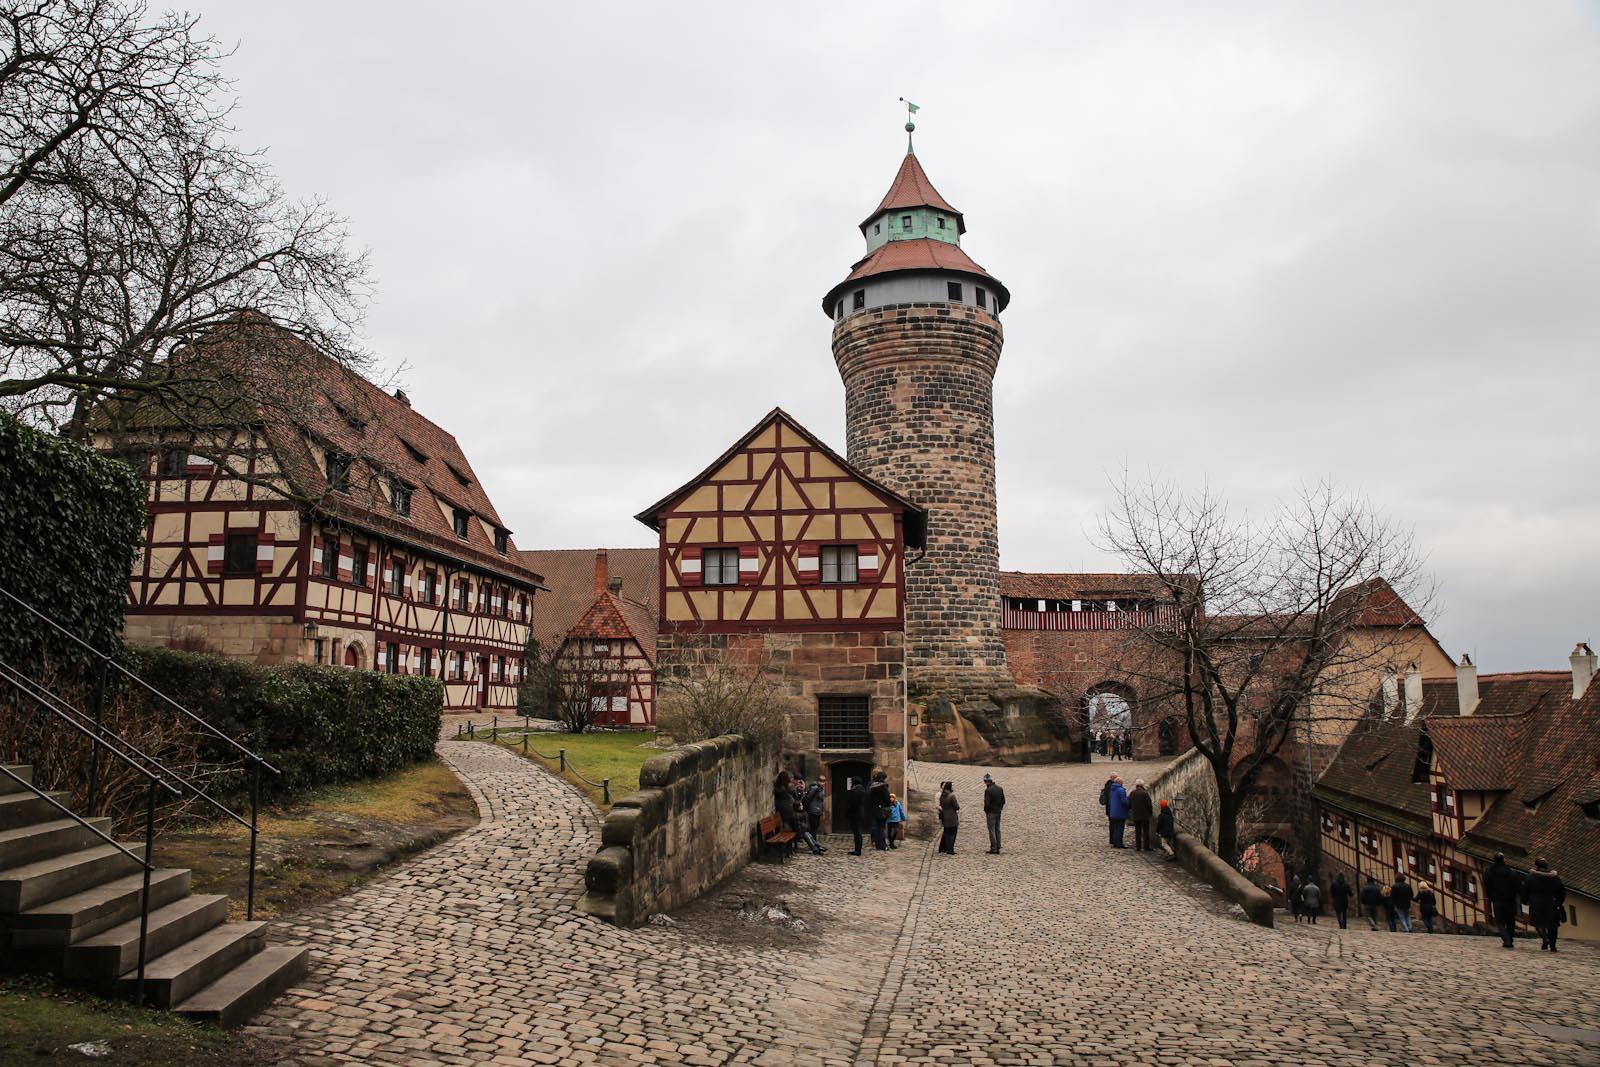 Замок в центре города Нюрнберг